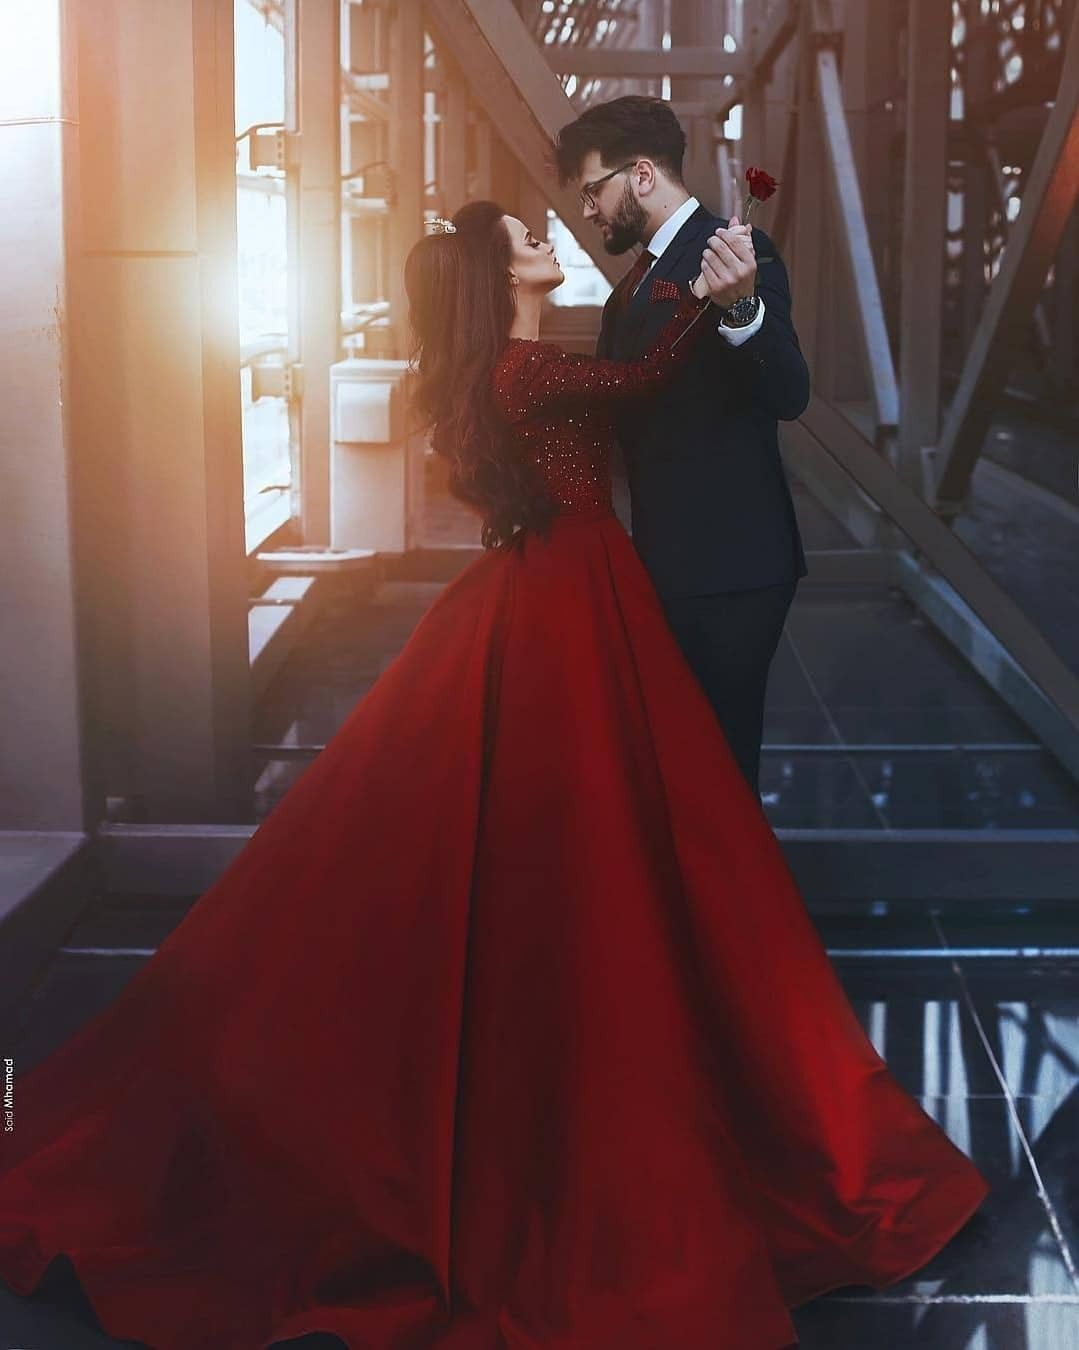 Red Dress Wedding Dress Long Sleeve Red Wedding Dresses Prom Dresses Ball Gown